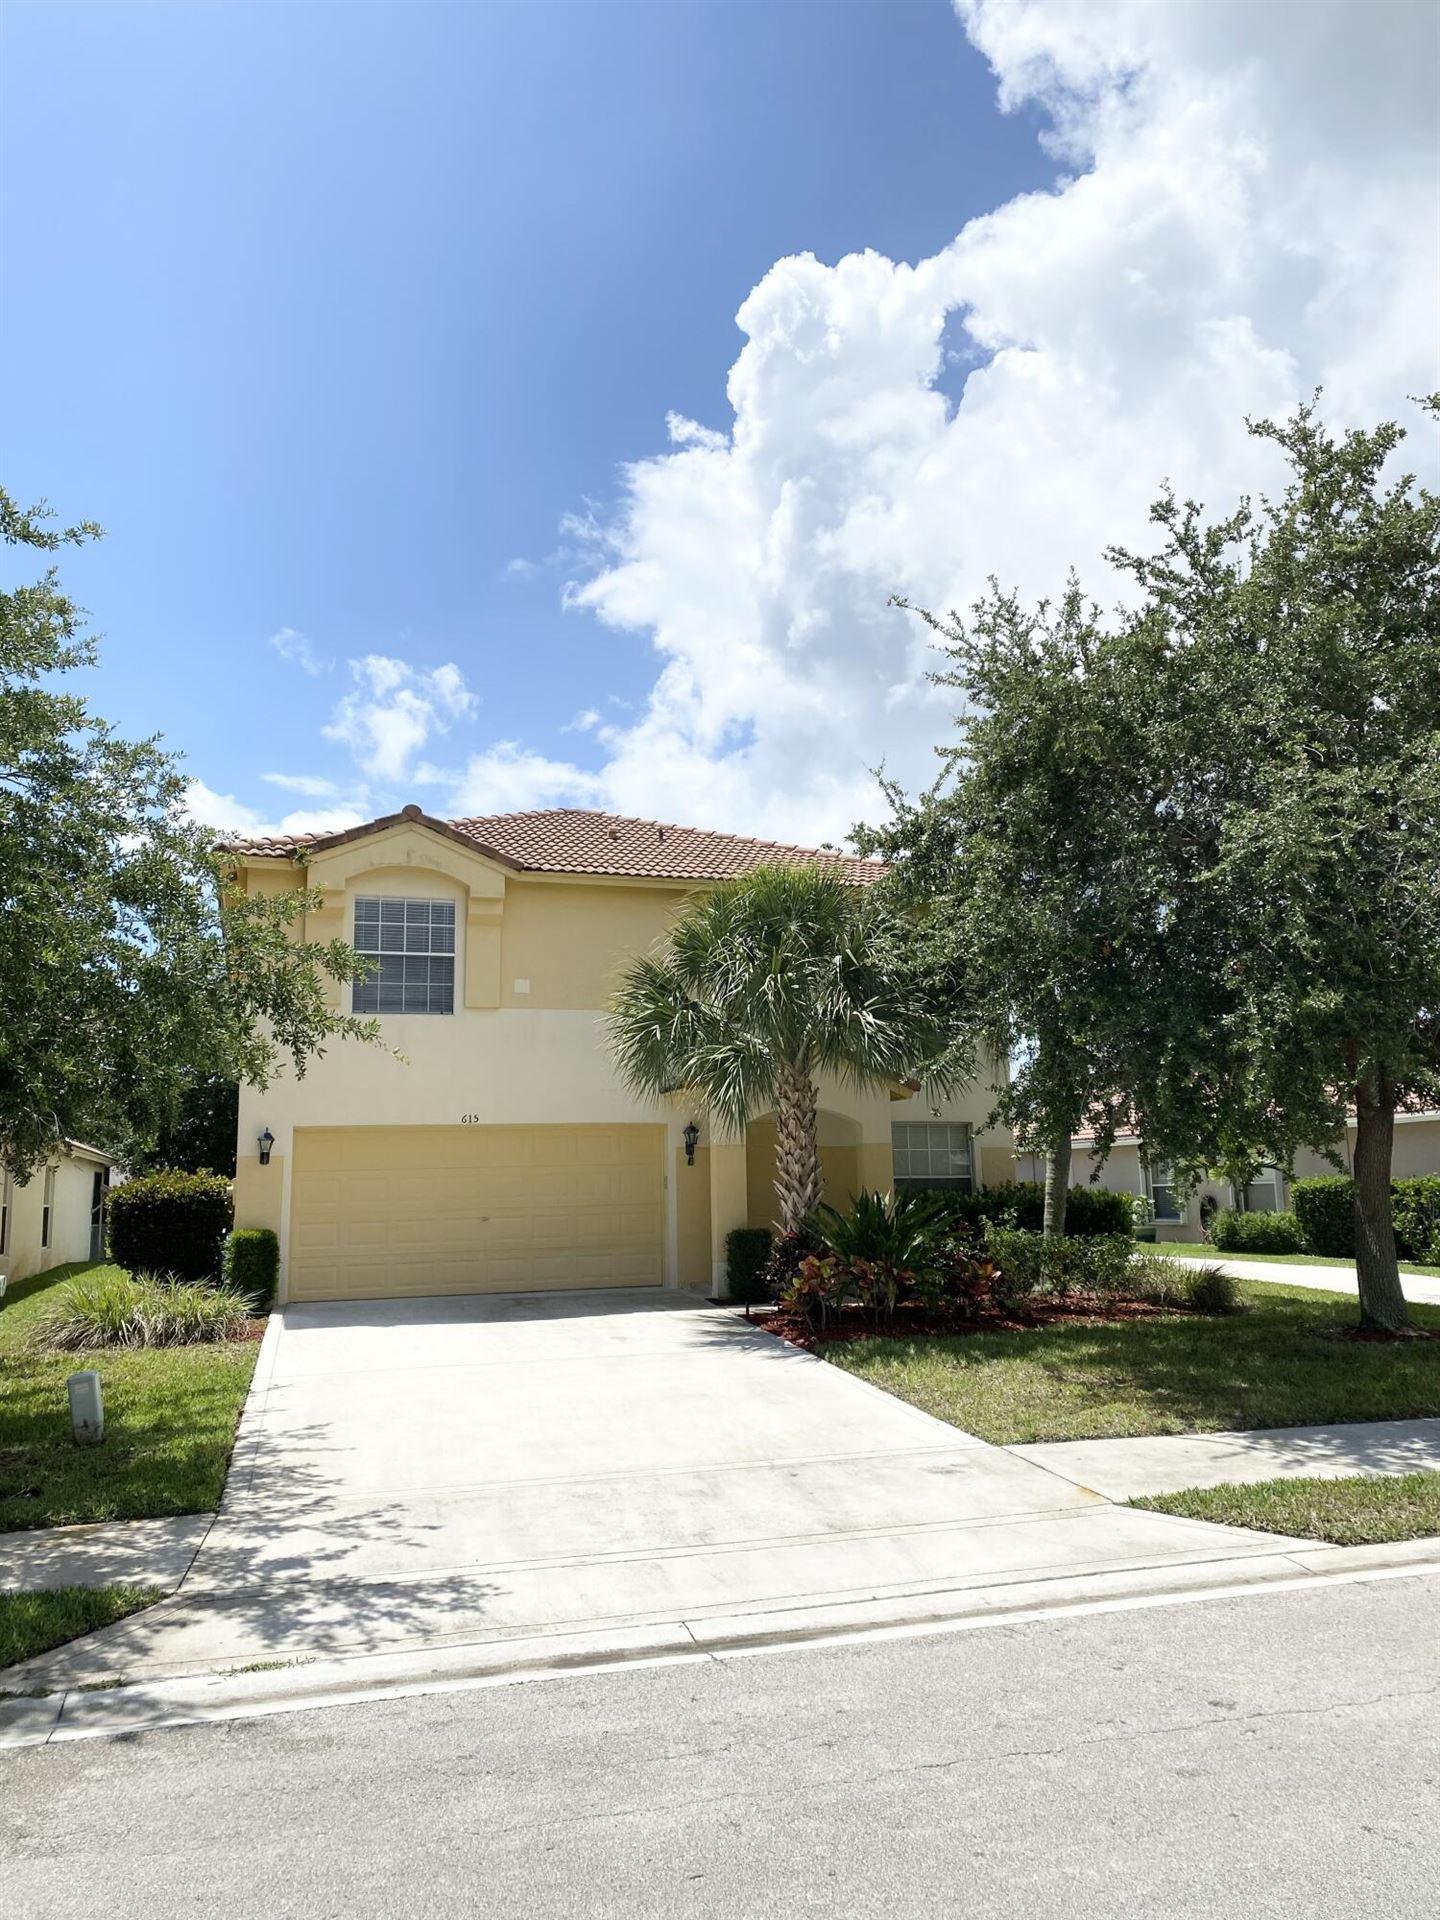 615 NW Stanford Lane, Port Saint Lucie, FL 34983 - MLS#: RX-10709118